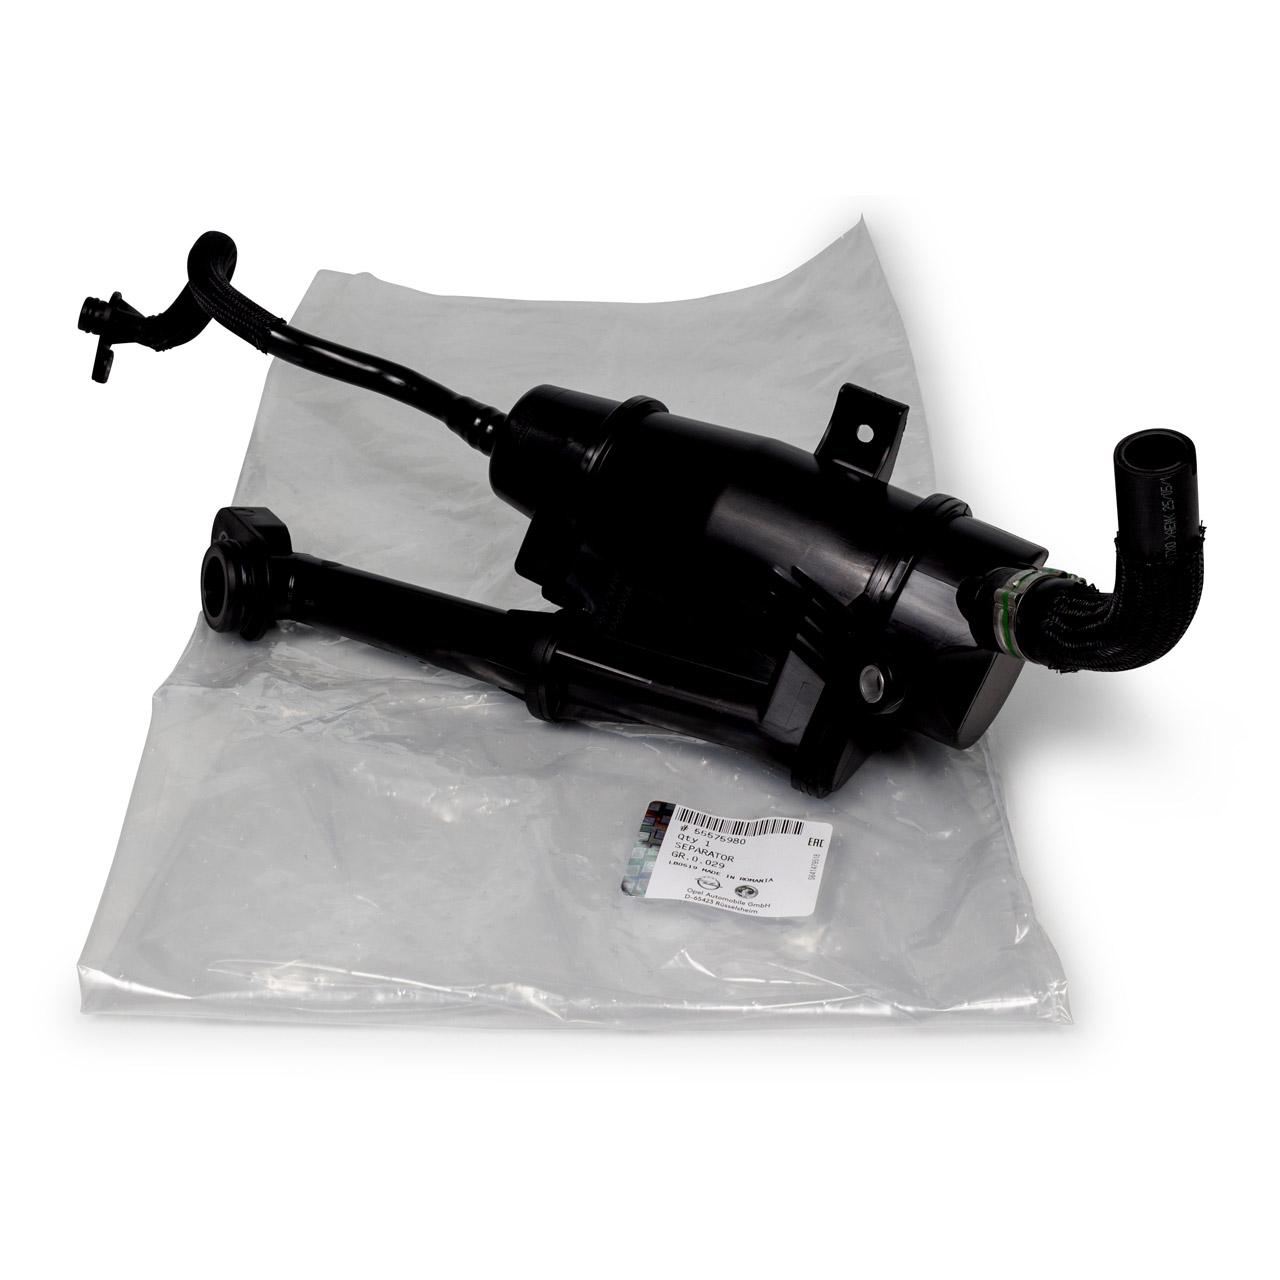 ORIGINAL Opel Ölabscheider Kurbelgehäuseentlüftung ASTRA J INSIGNIA A 2.0 CDTI 55575980